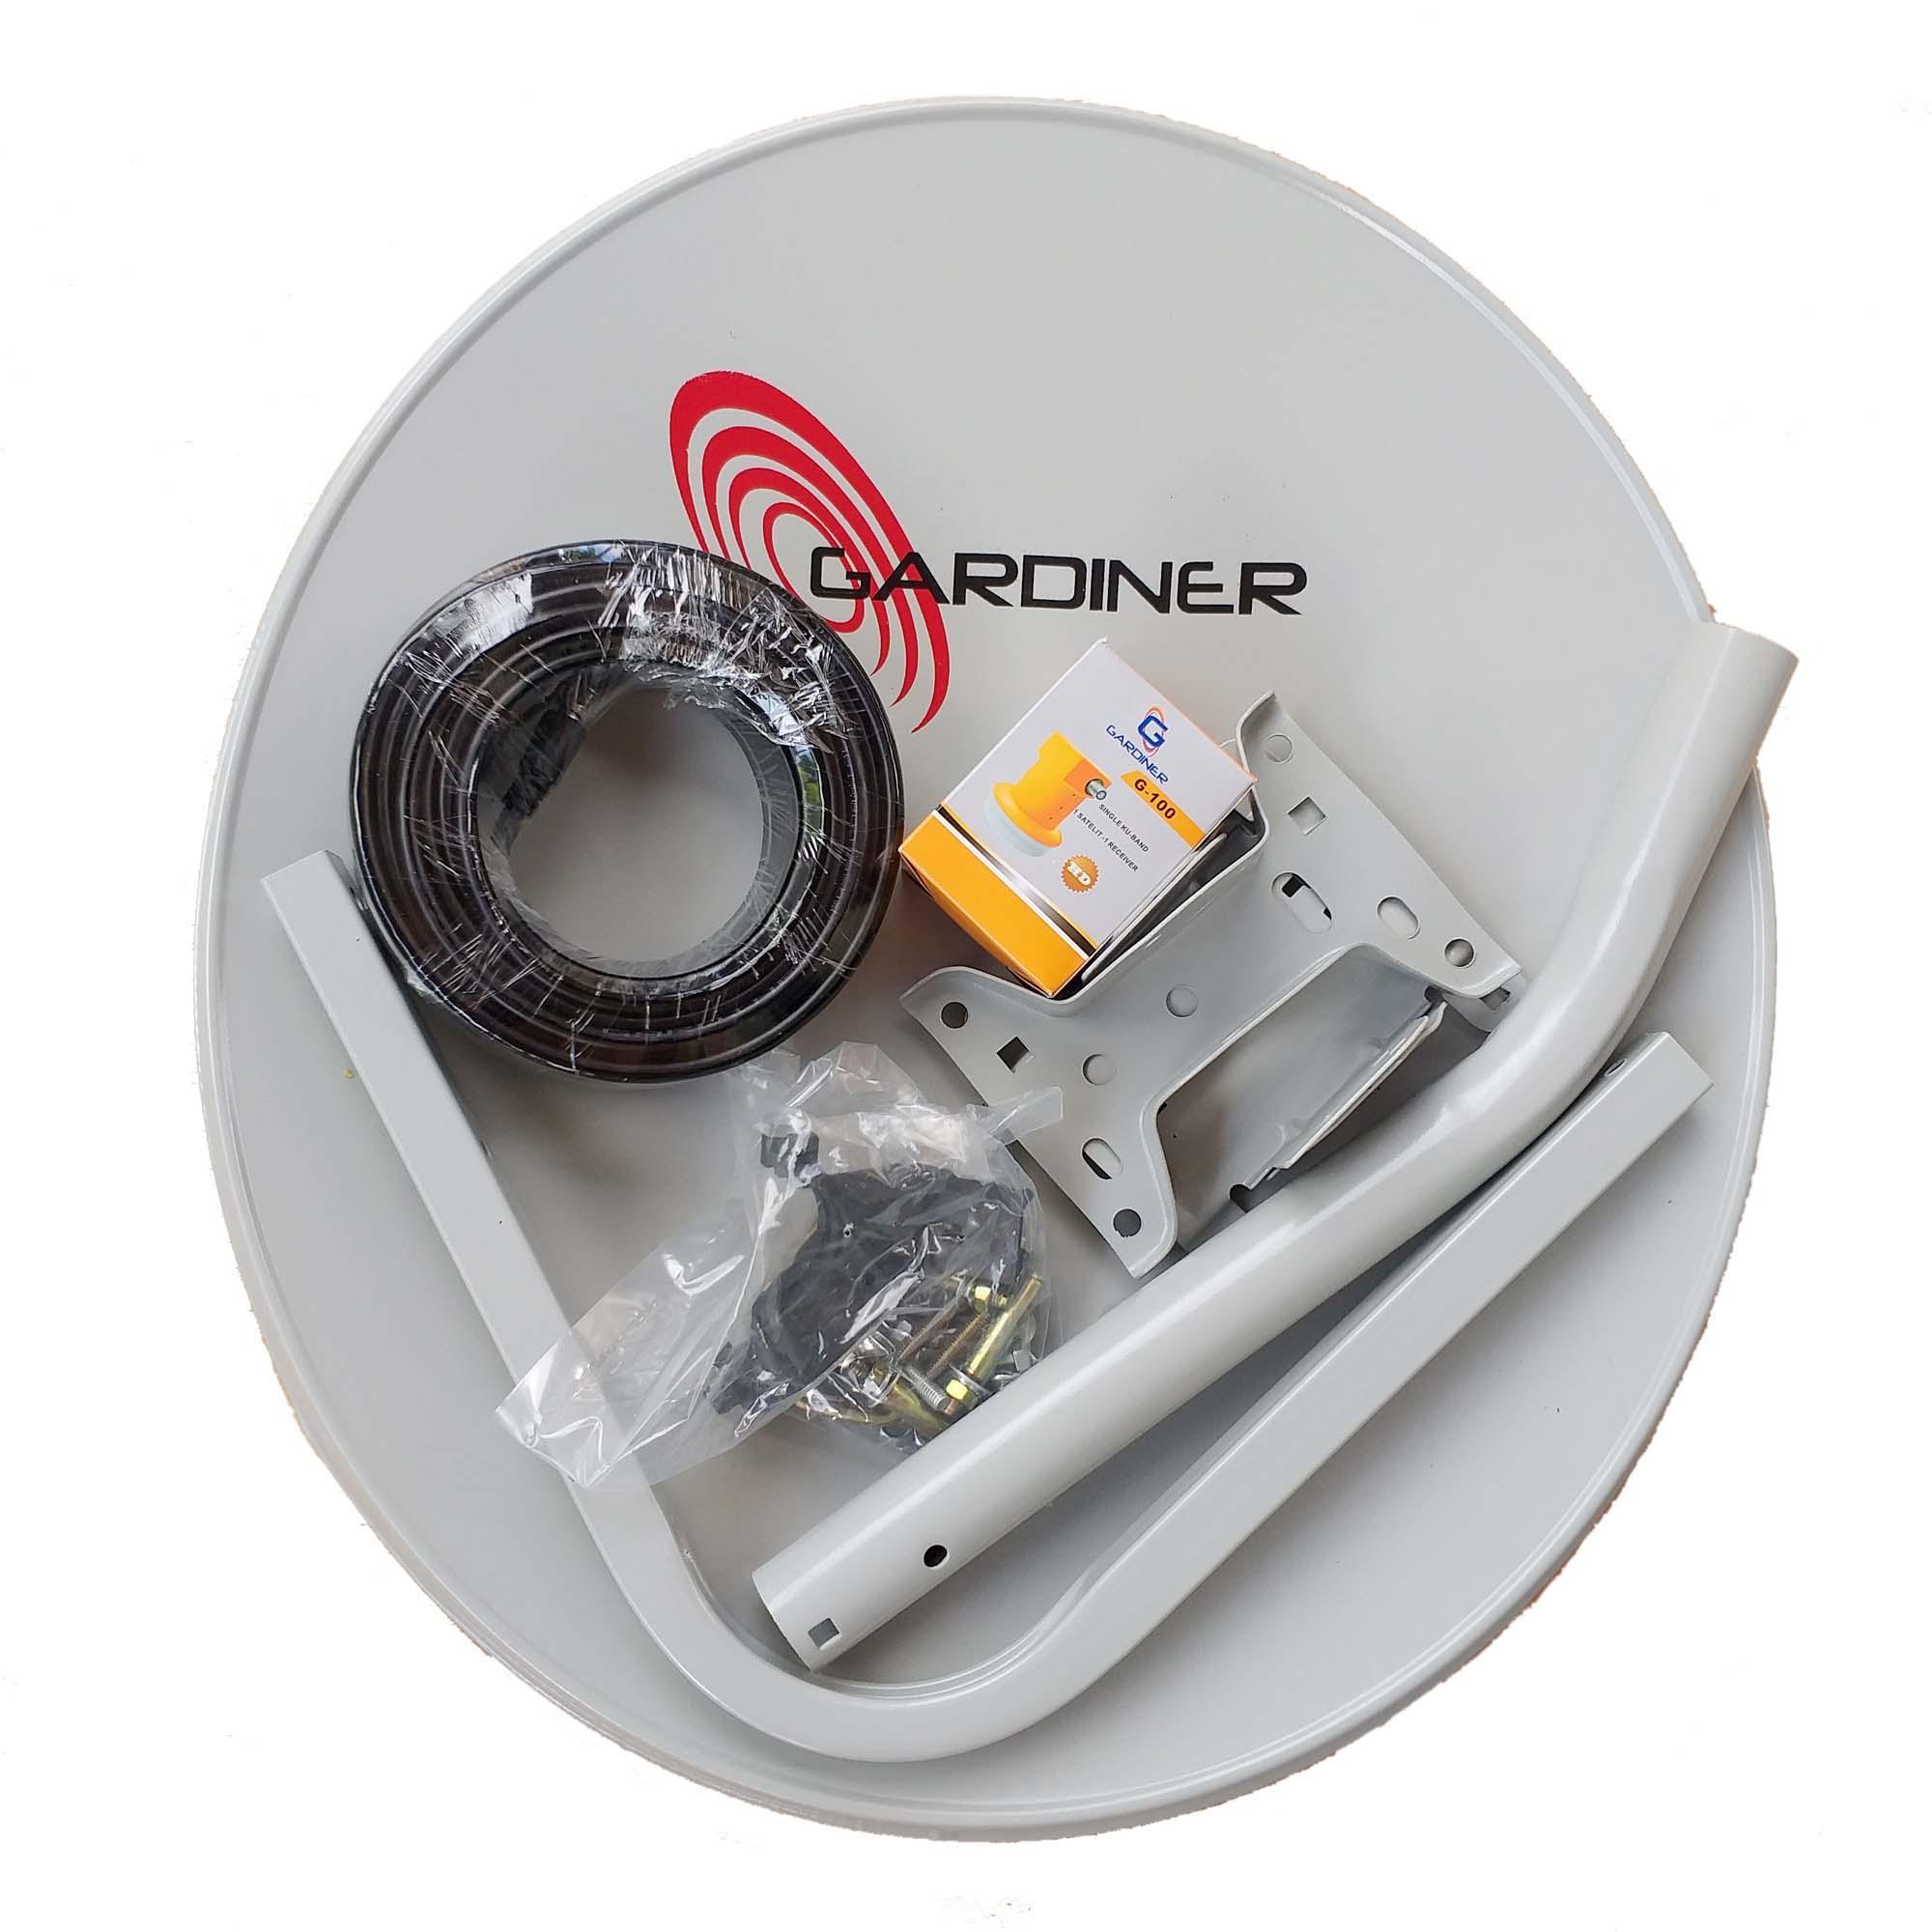 Antena Parabola Mini ODU Ninmedia Lnb + Kabel [tanpa Receiver]